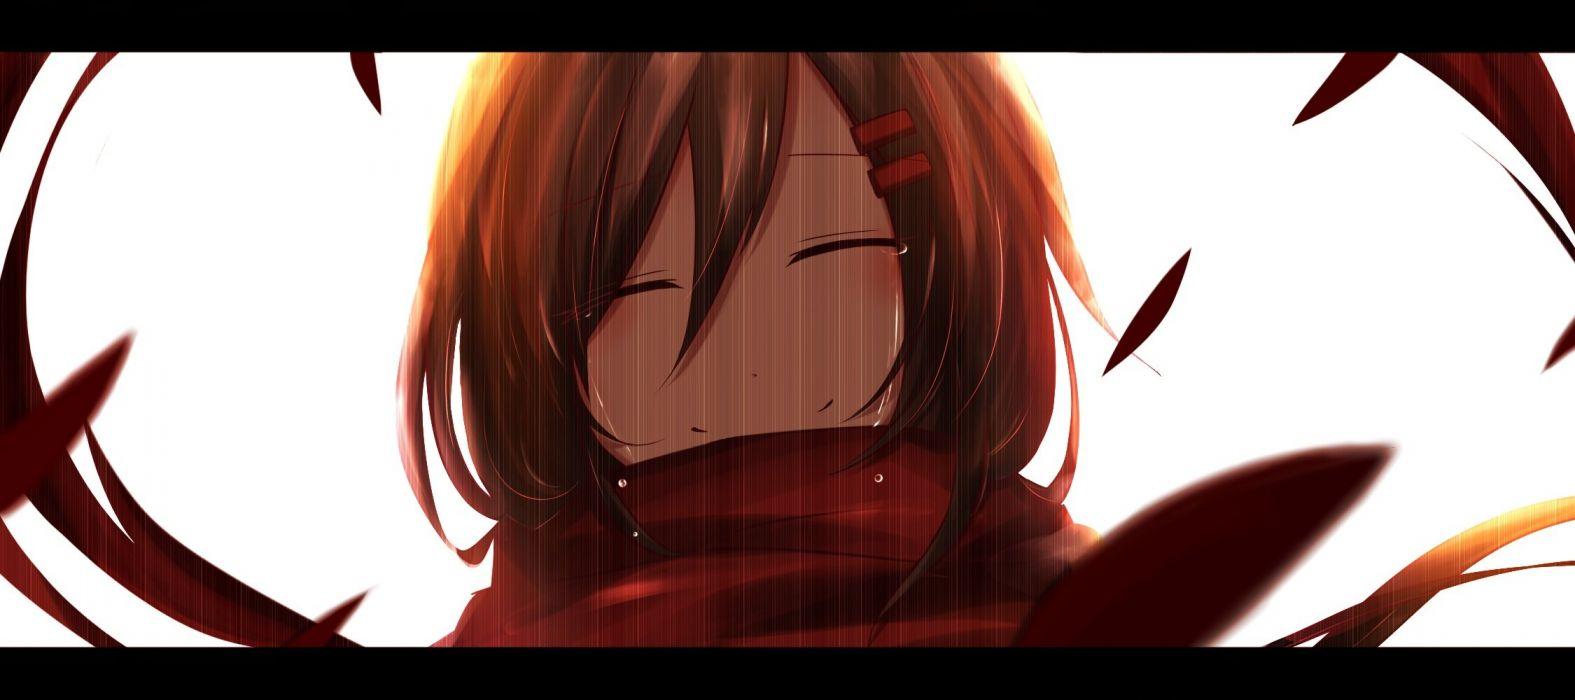 brown hair kagerou project kiriya black tateyama ayano tears wallpaper